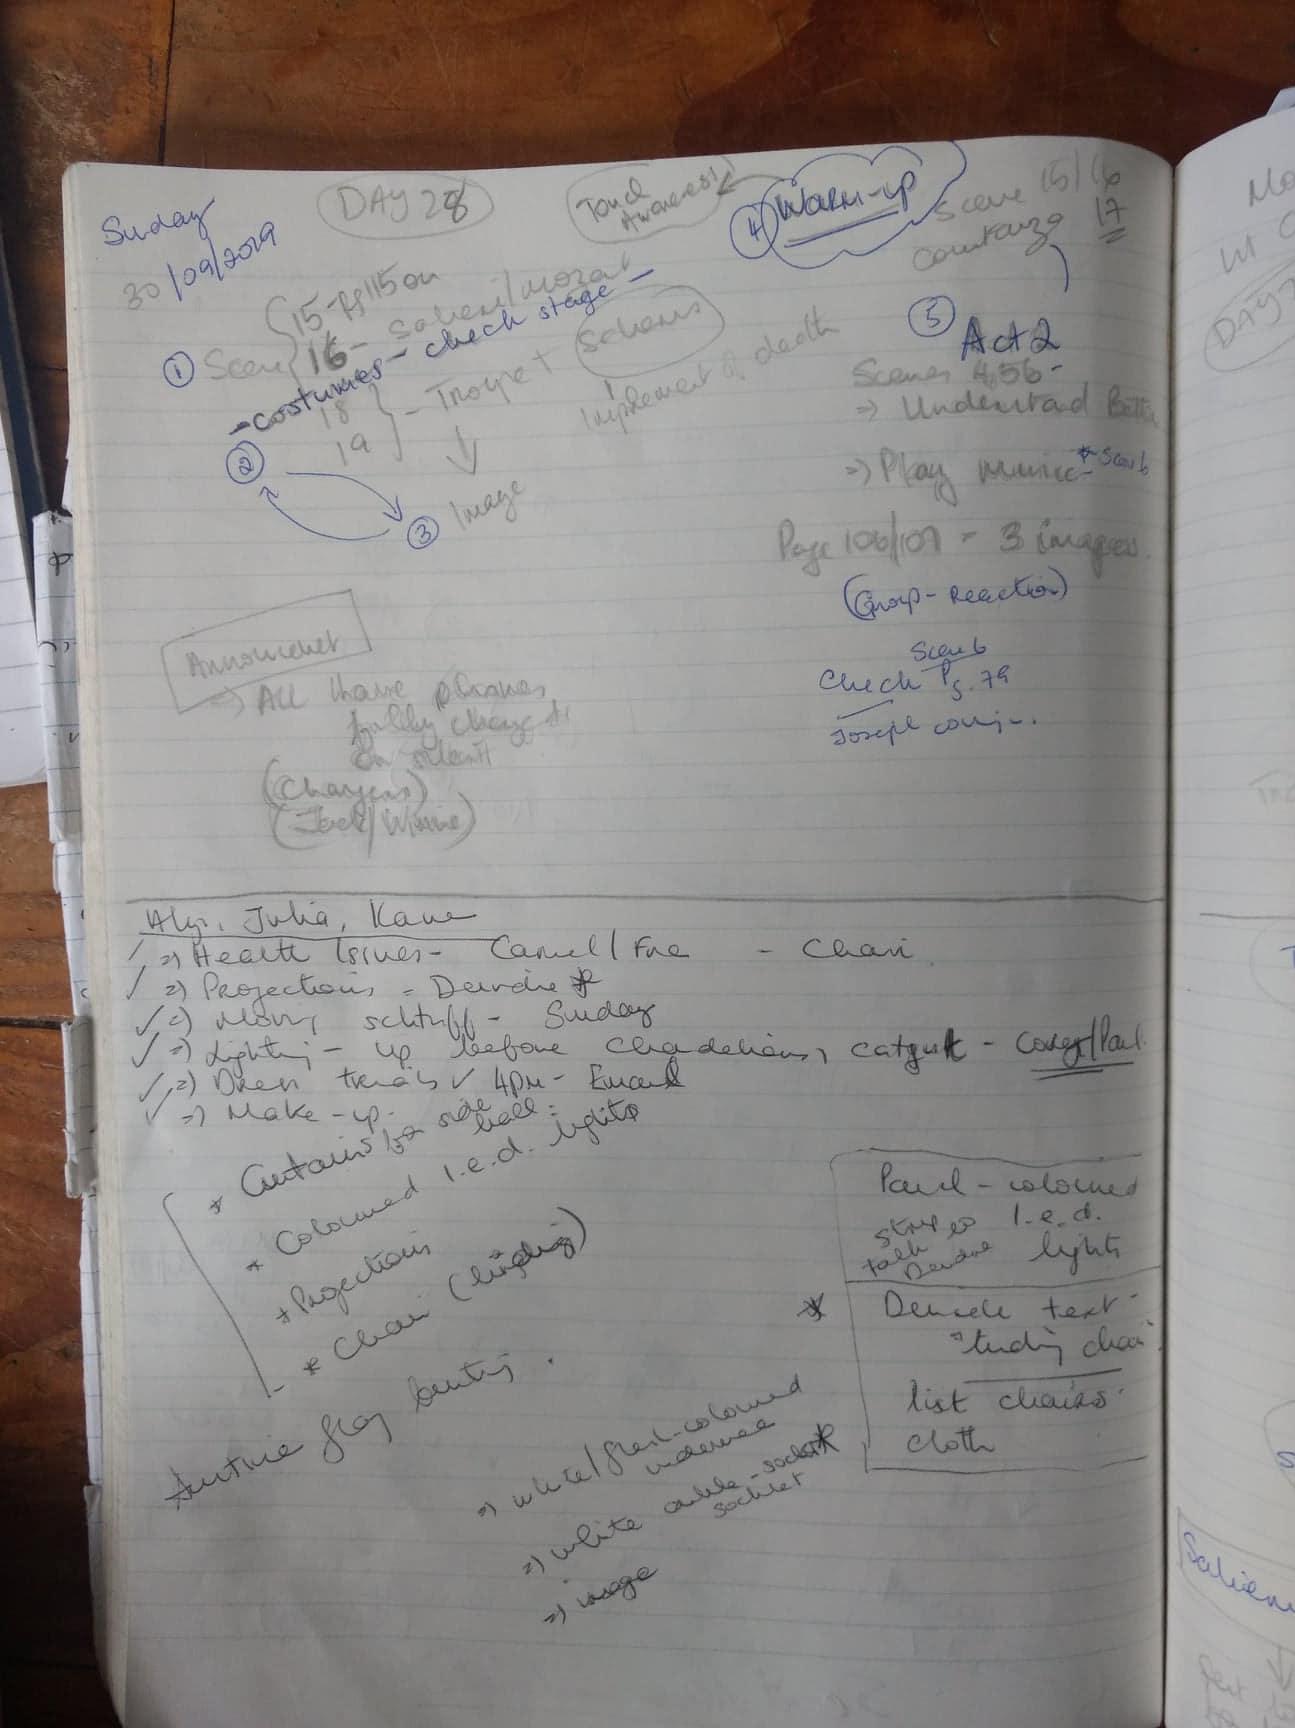 Notes - Blog 28:29